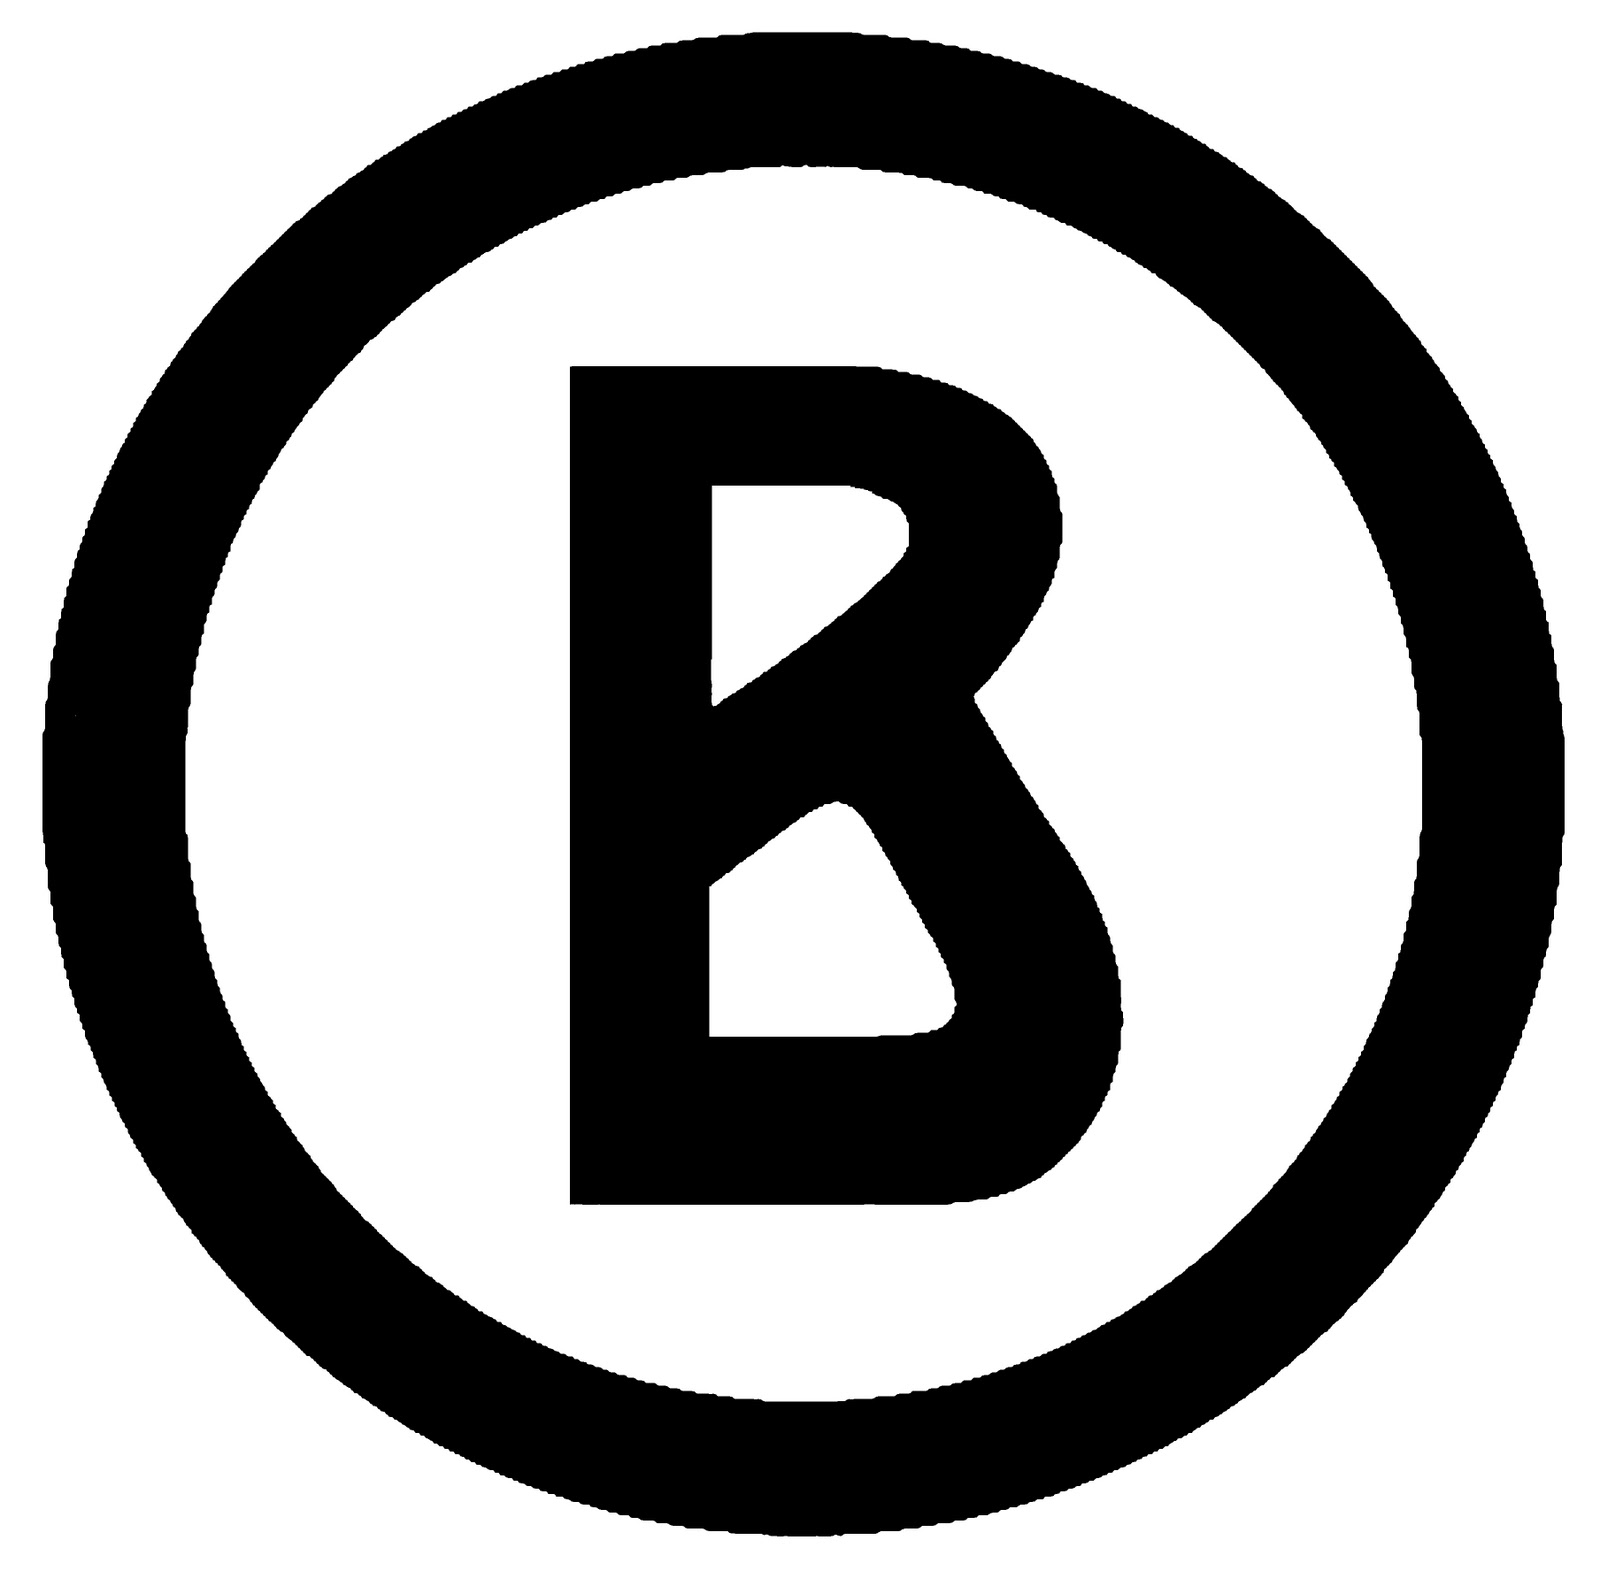 Be_boys: ____Be__Boys____: blog-beboys.blogspot.com/2011/04/beboys.html